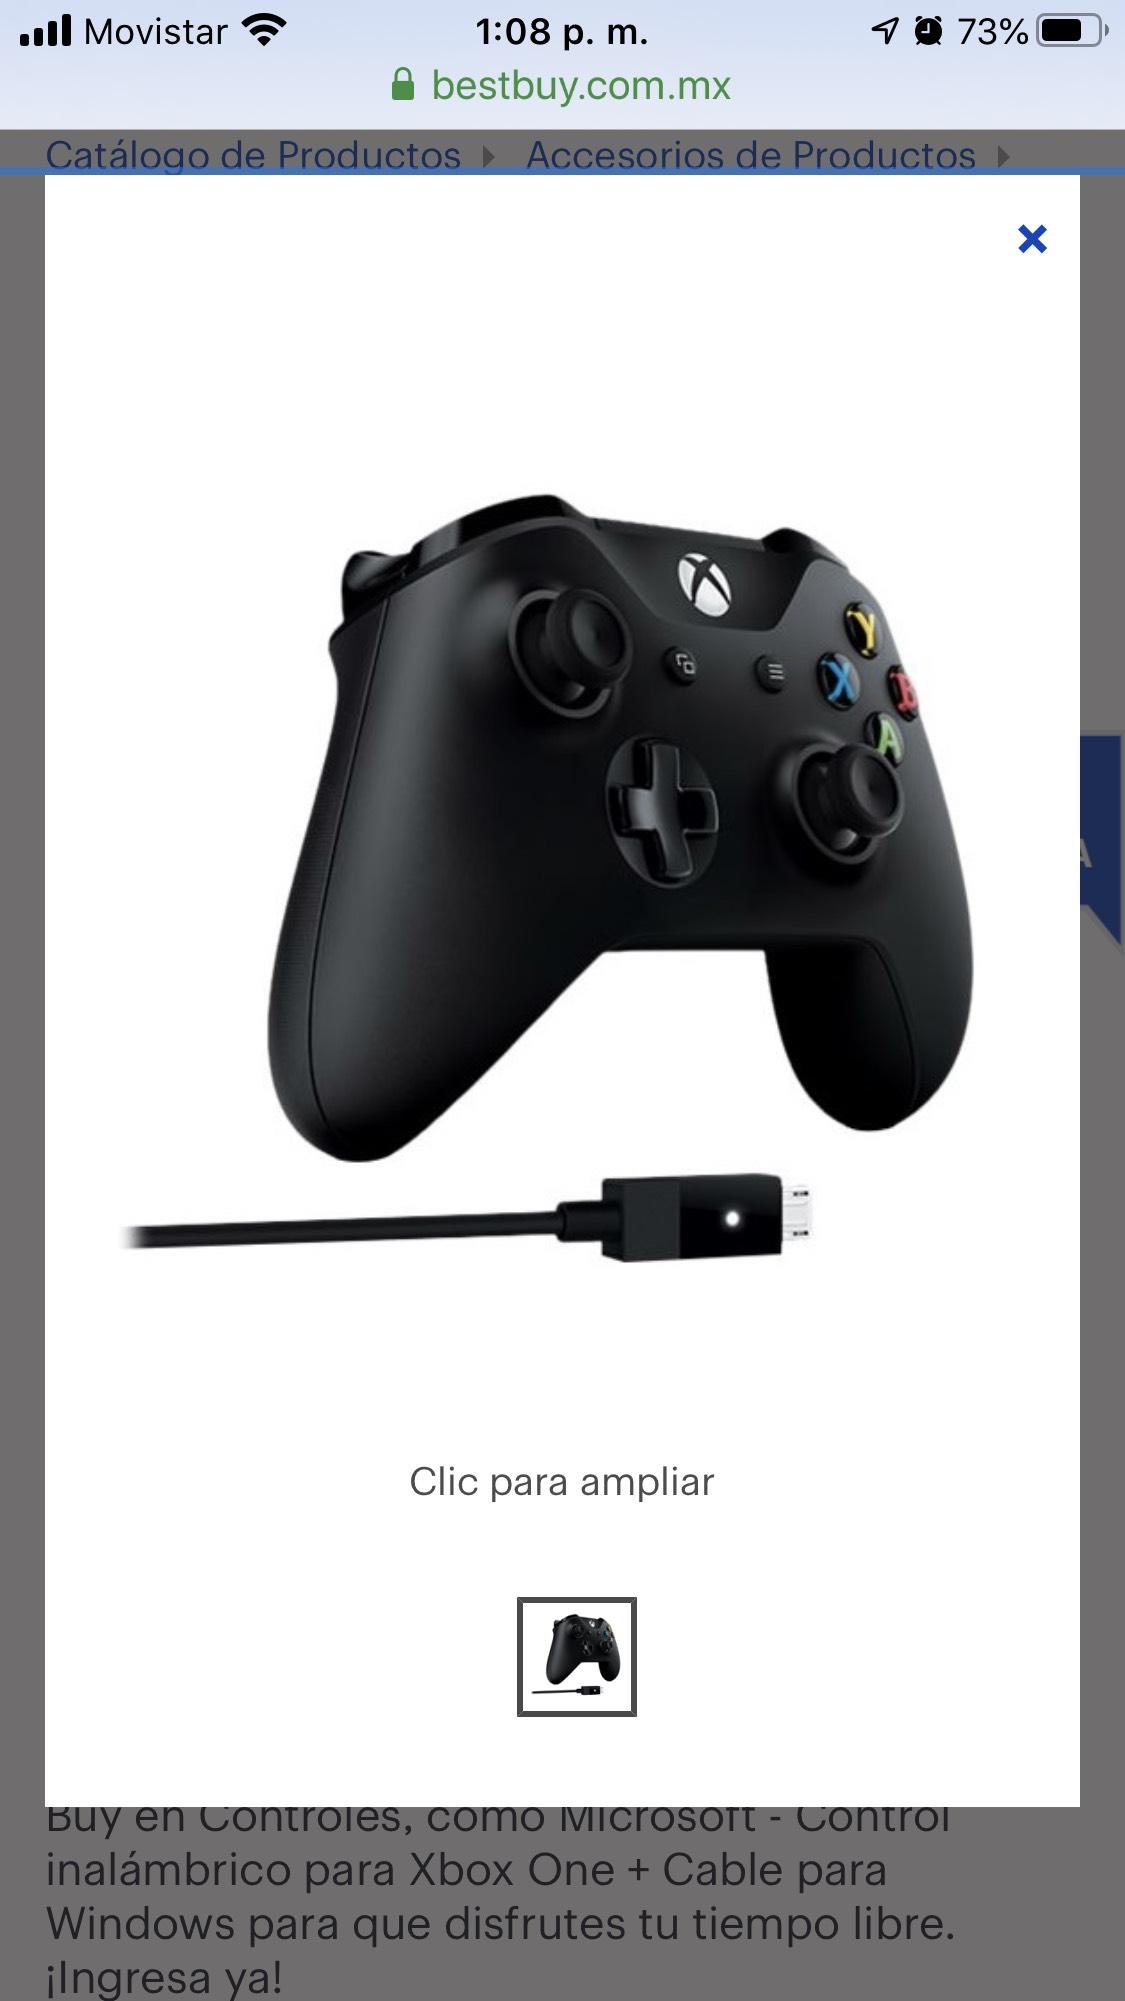 Best Buy: Microsoft - Control inalámbrico para Xbox One + Cable para Windows - Negro